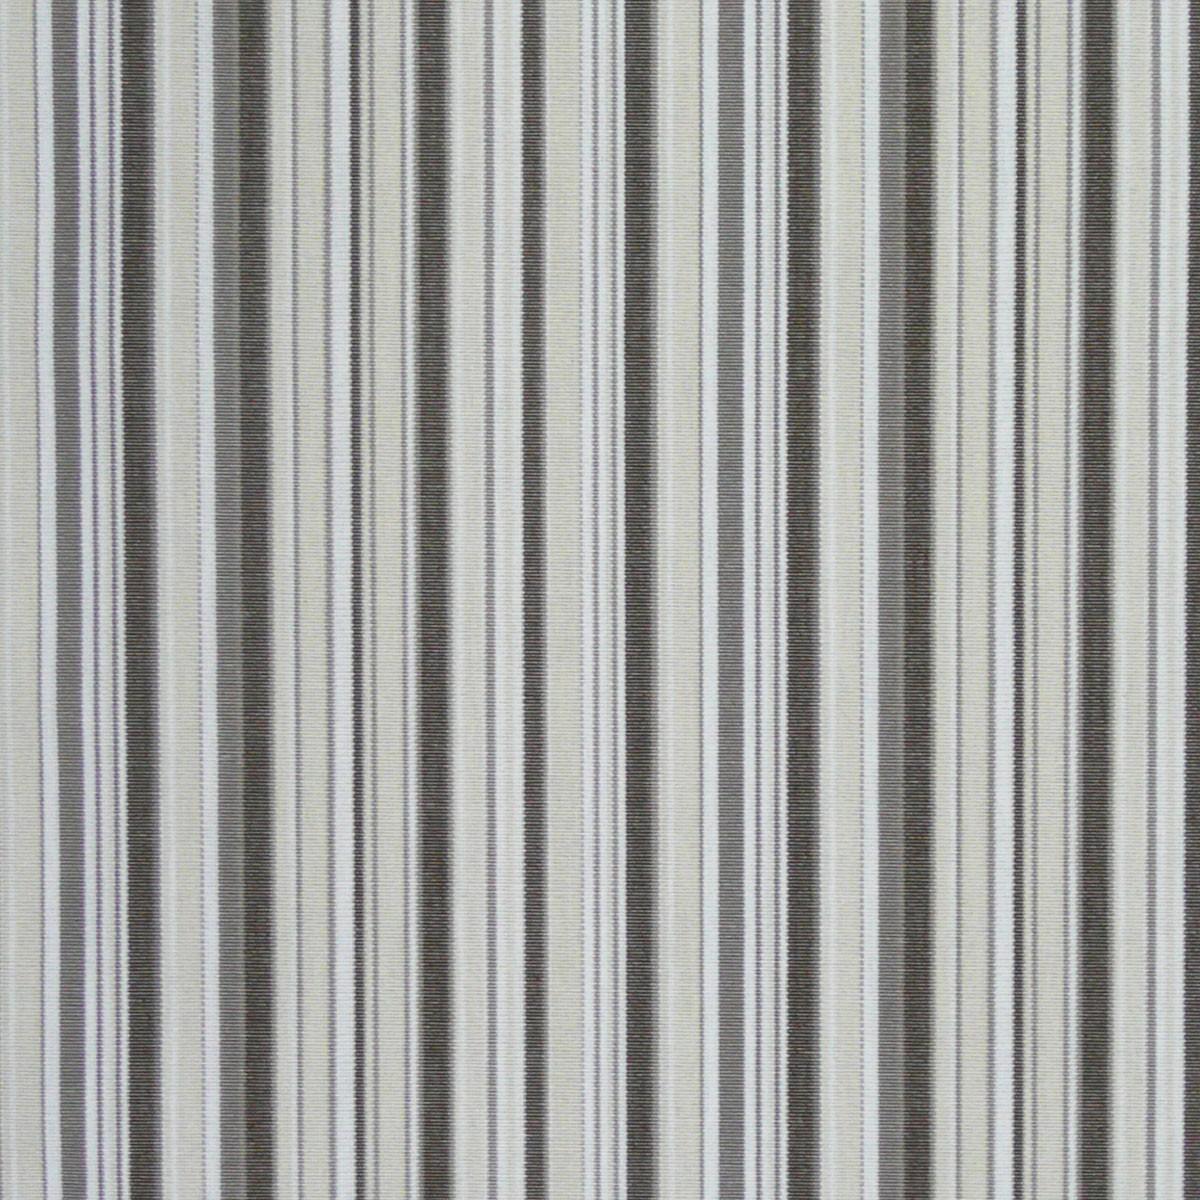 outdoor markisenstoff gartenm belstoff toldo streifen. Black Bedroom Furniture Sets. Home Design Ideas